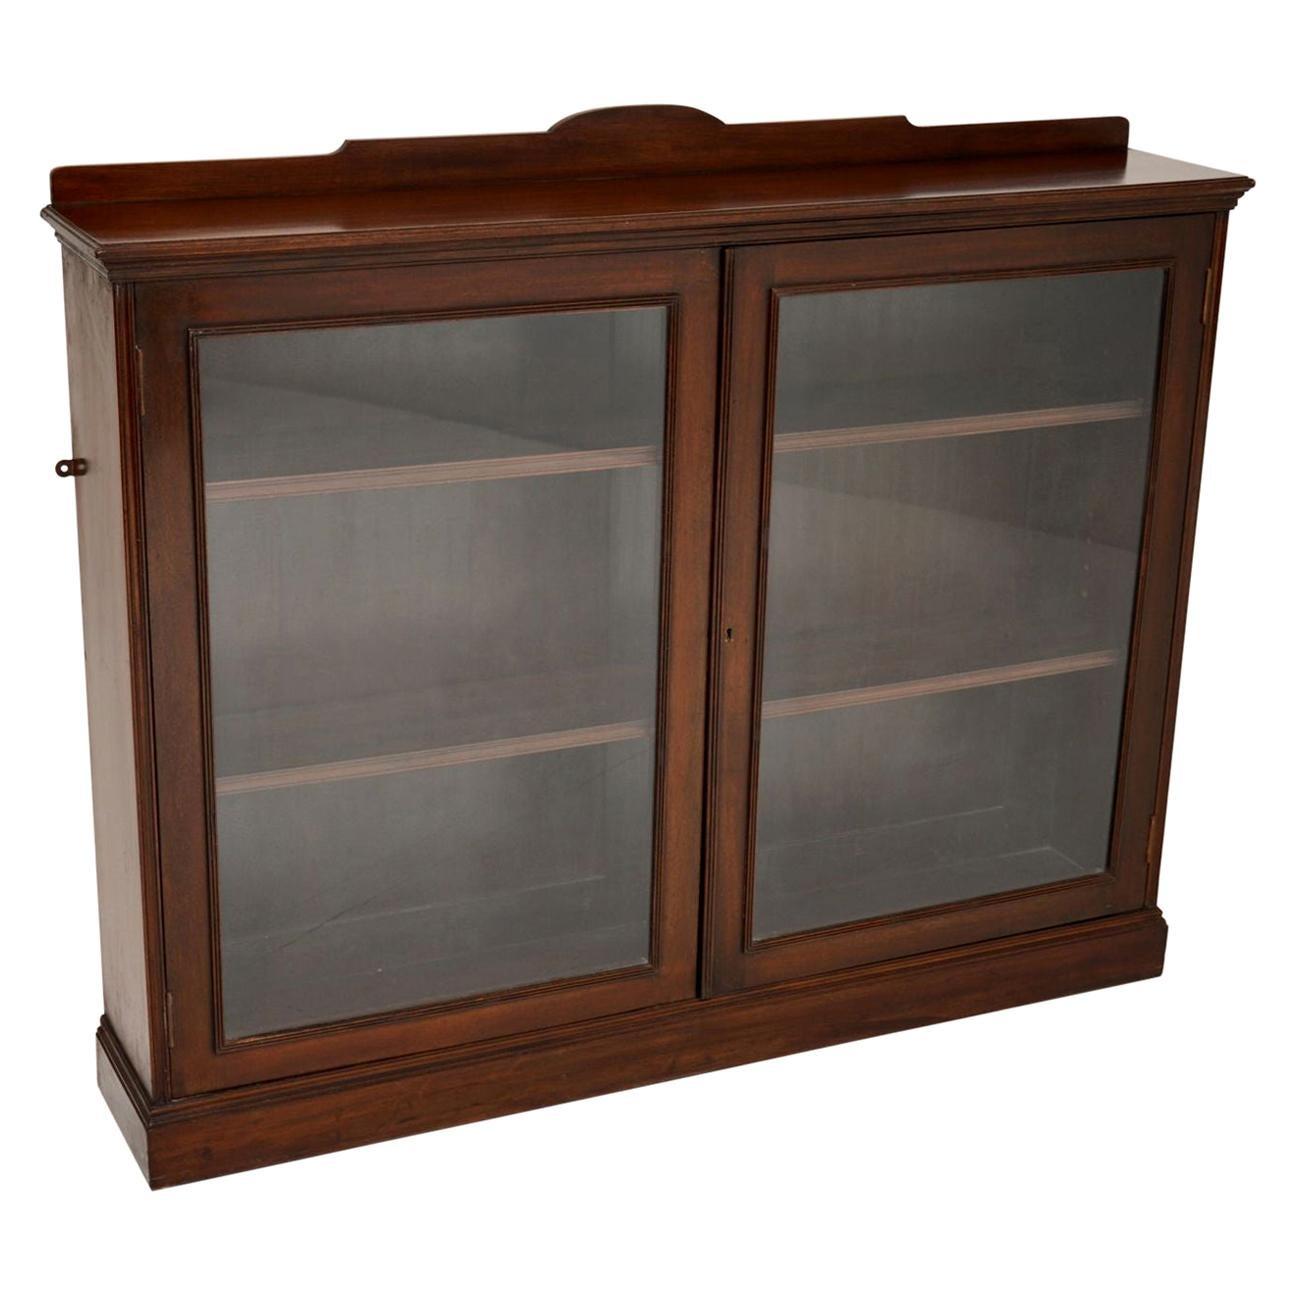 Antique Victorian Mahogany Two-Door Bookcase